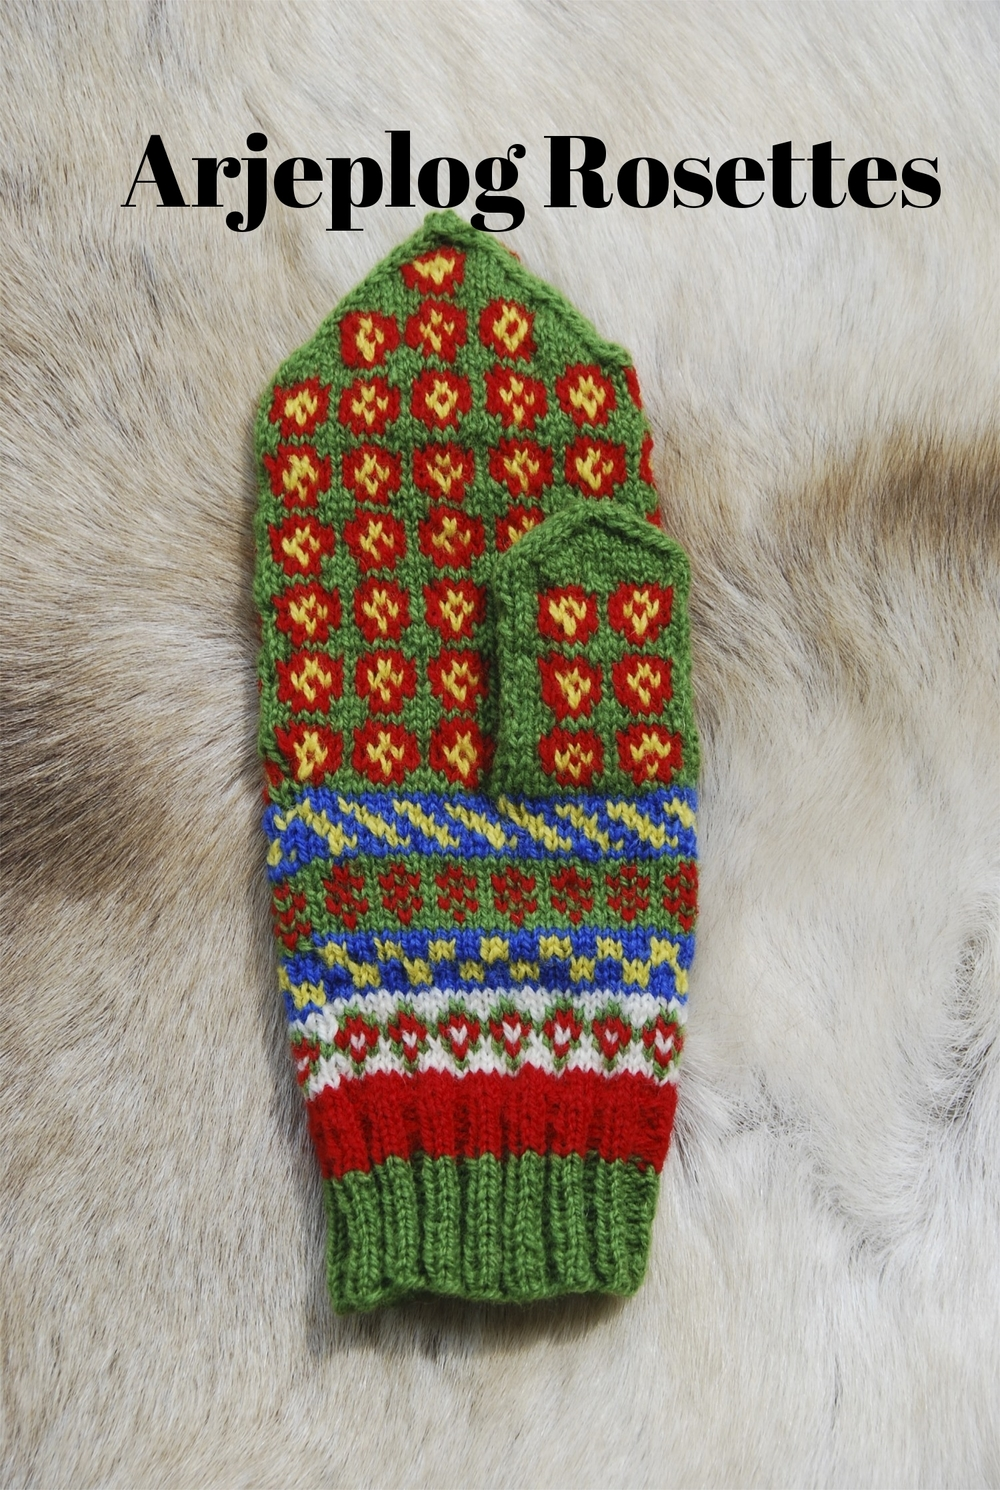 Arjeplog Rosettes, Swedish Sámi Knitted Mittens